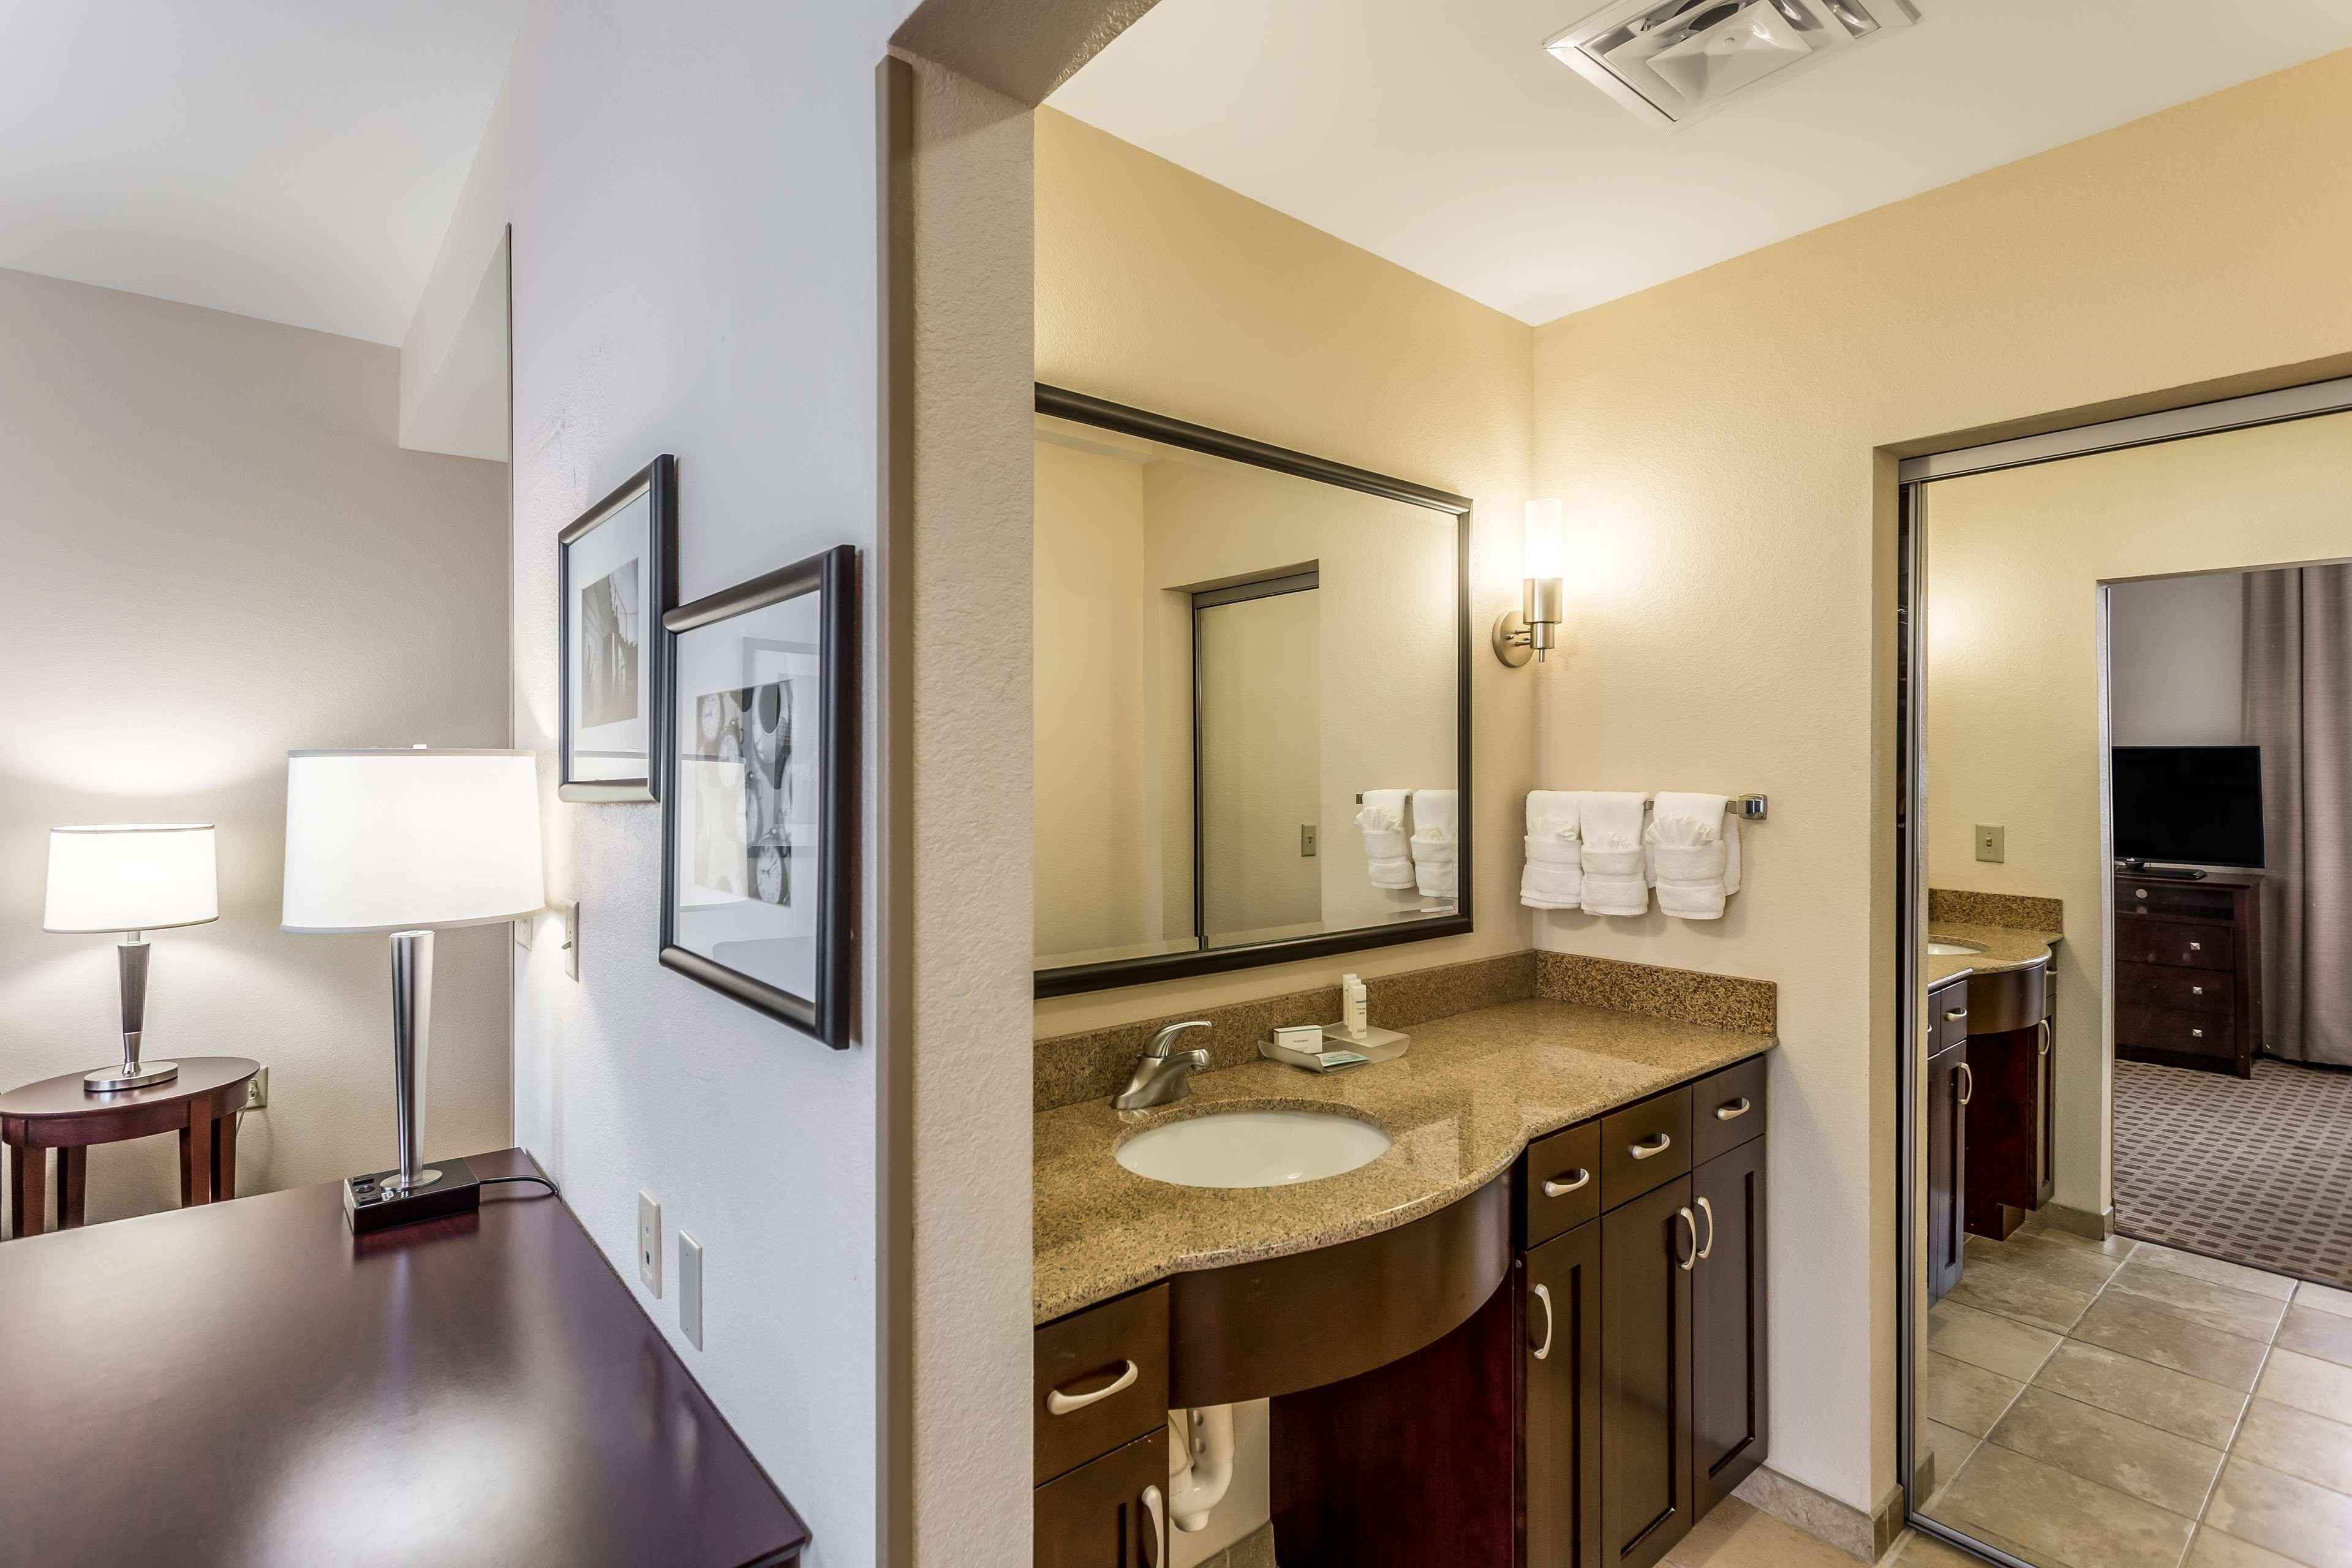 Homewood Suites by Hilton Nashville-Downtown image 15